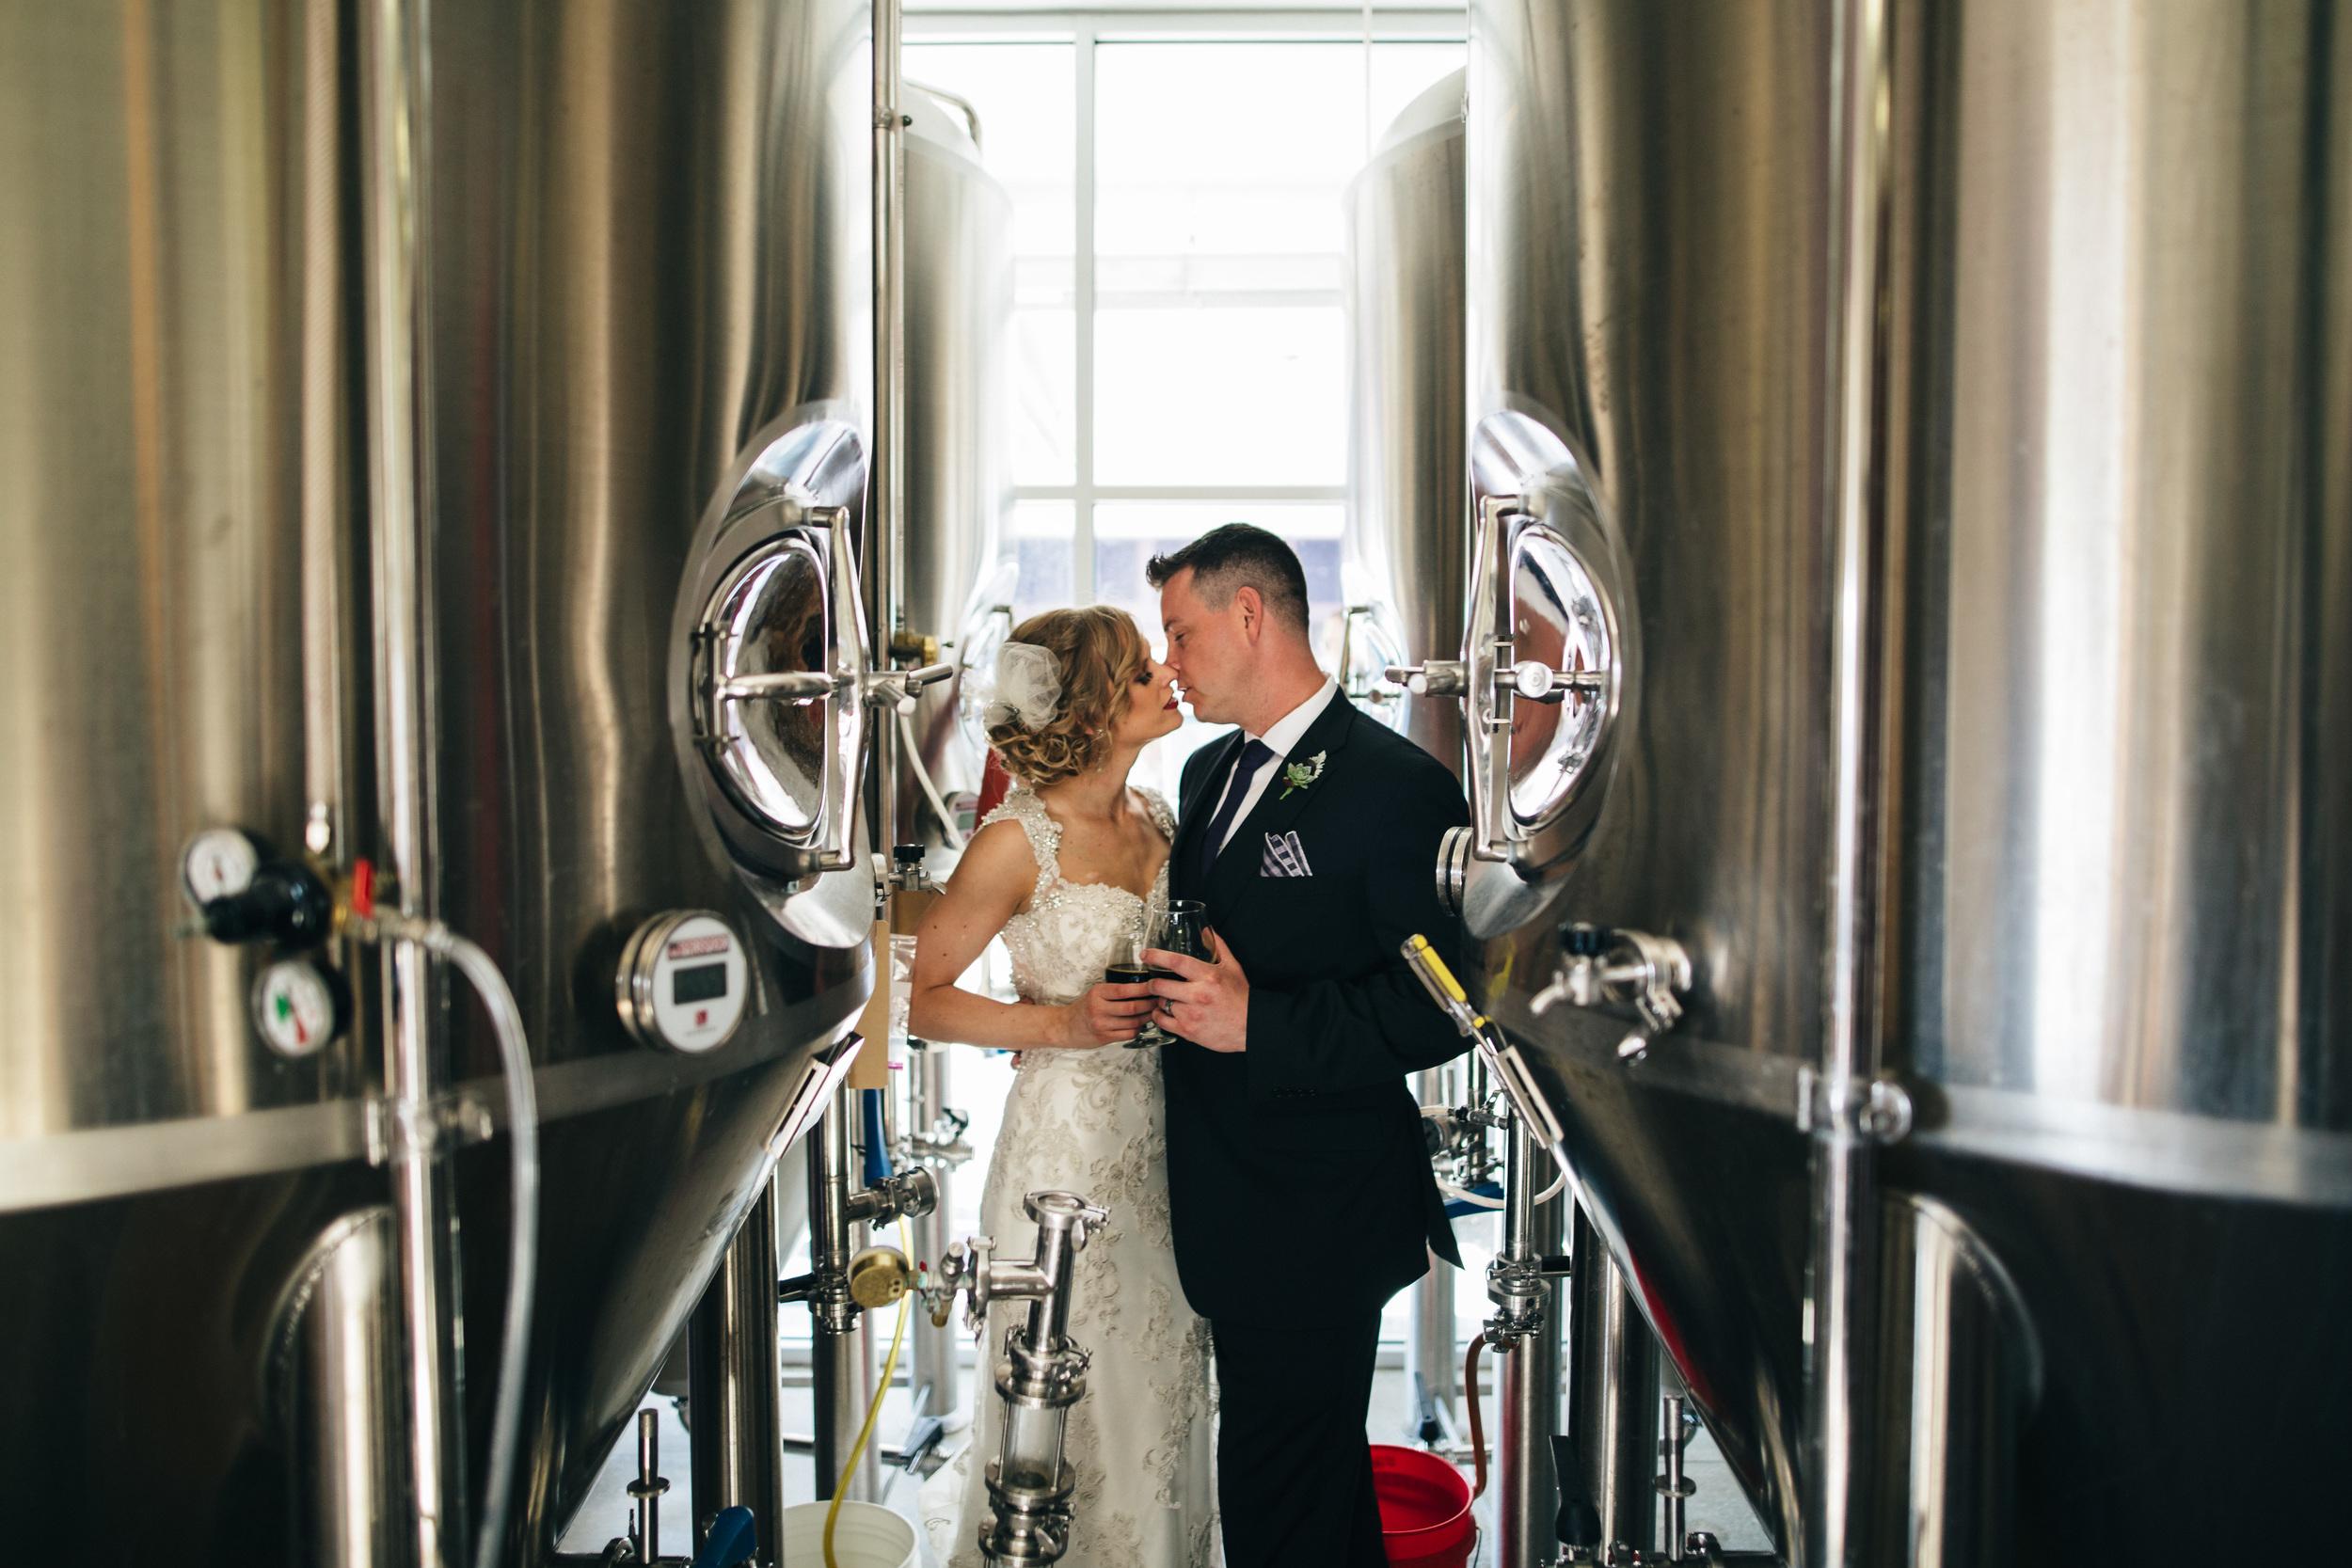 Wedding photography in brewery at Catawba Island Brewery.